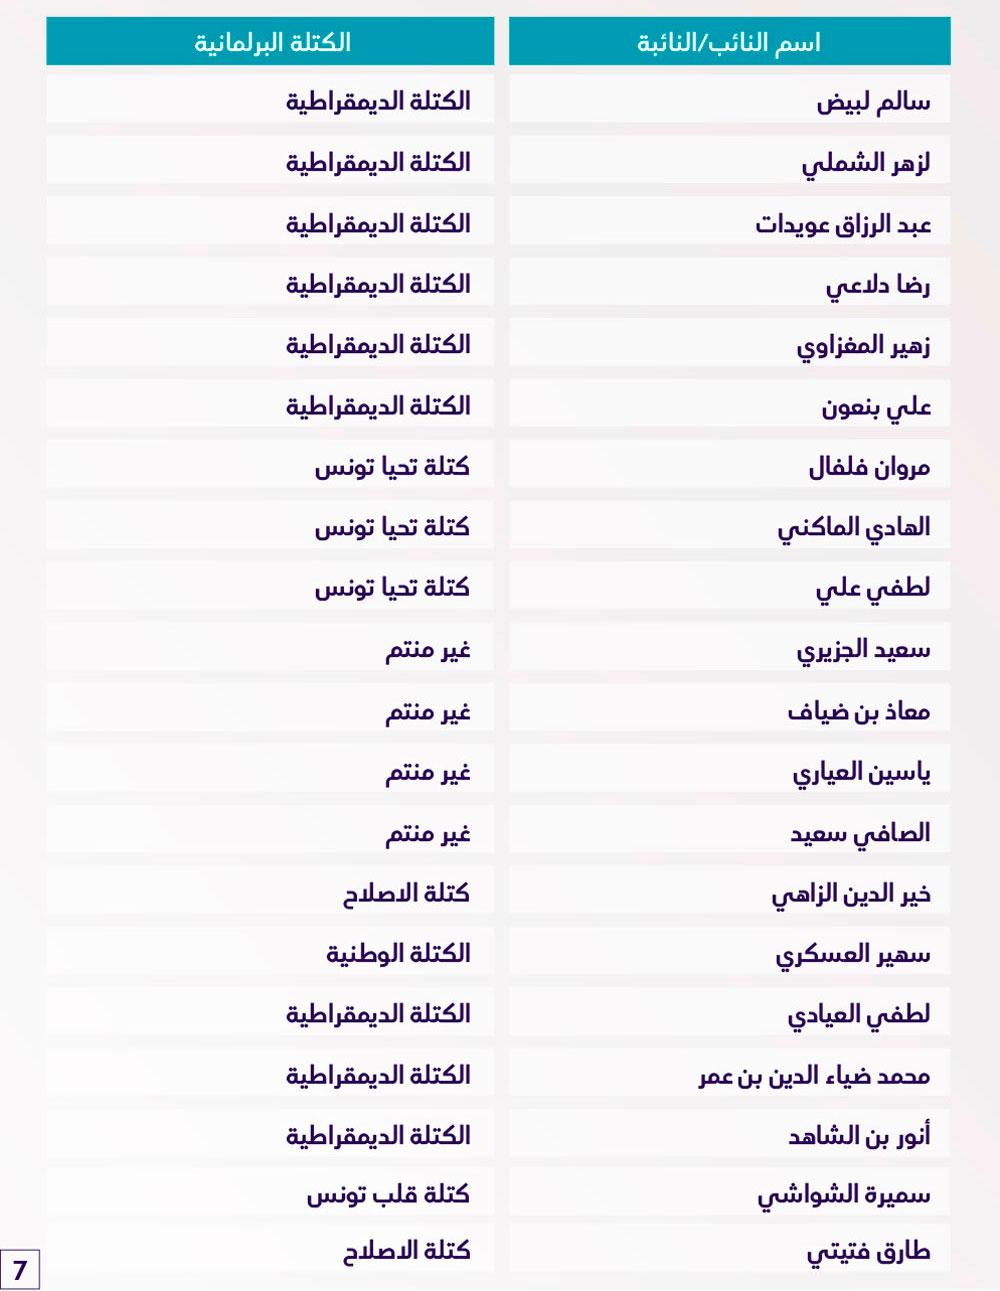 vote-bawsala-300720--7.jpg